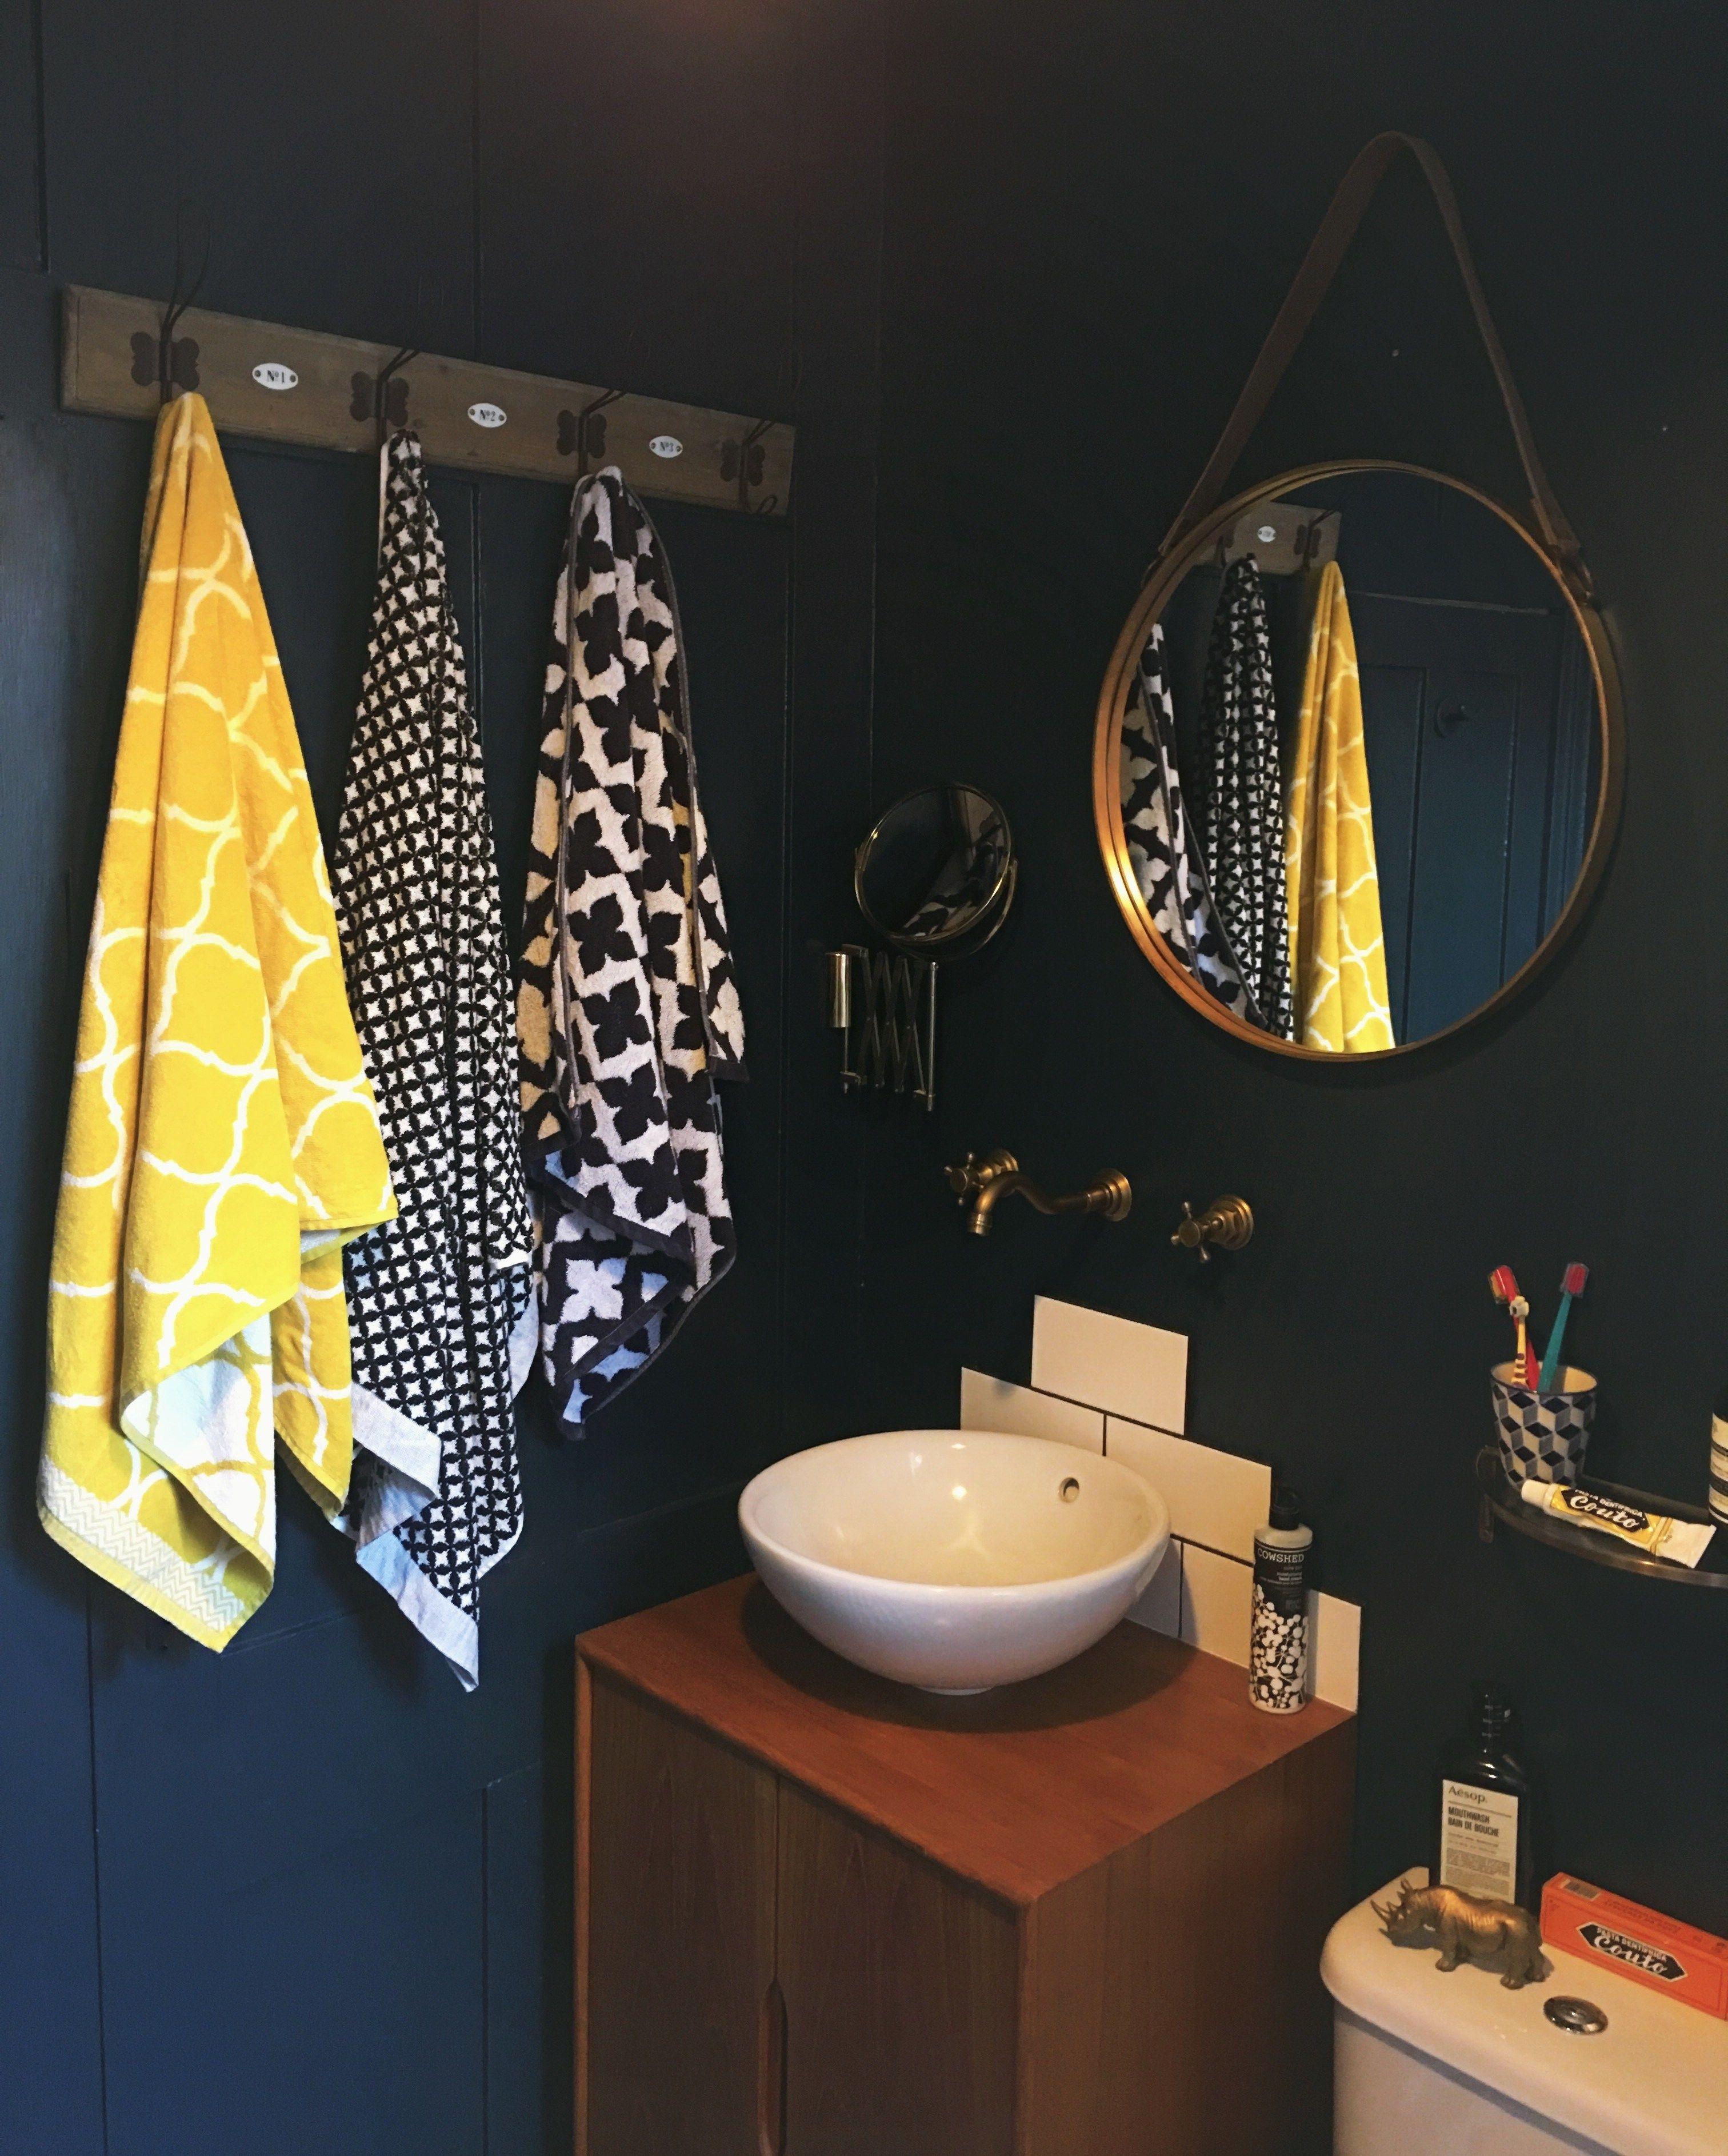 Hague Blue Moroccan Towels Teak Vanity Unit Vintage Brass - Vintage vanity units for bathrooms for bathroom decor ideas